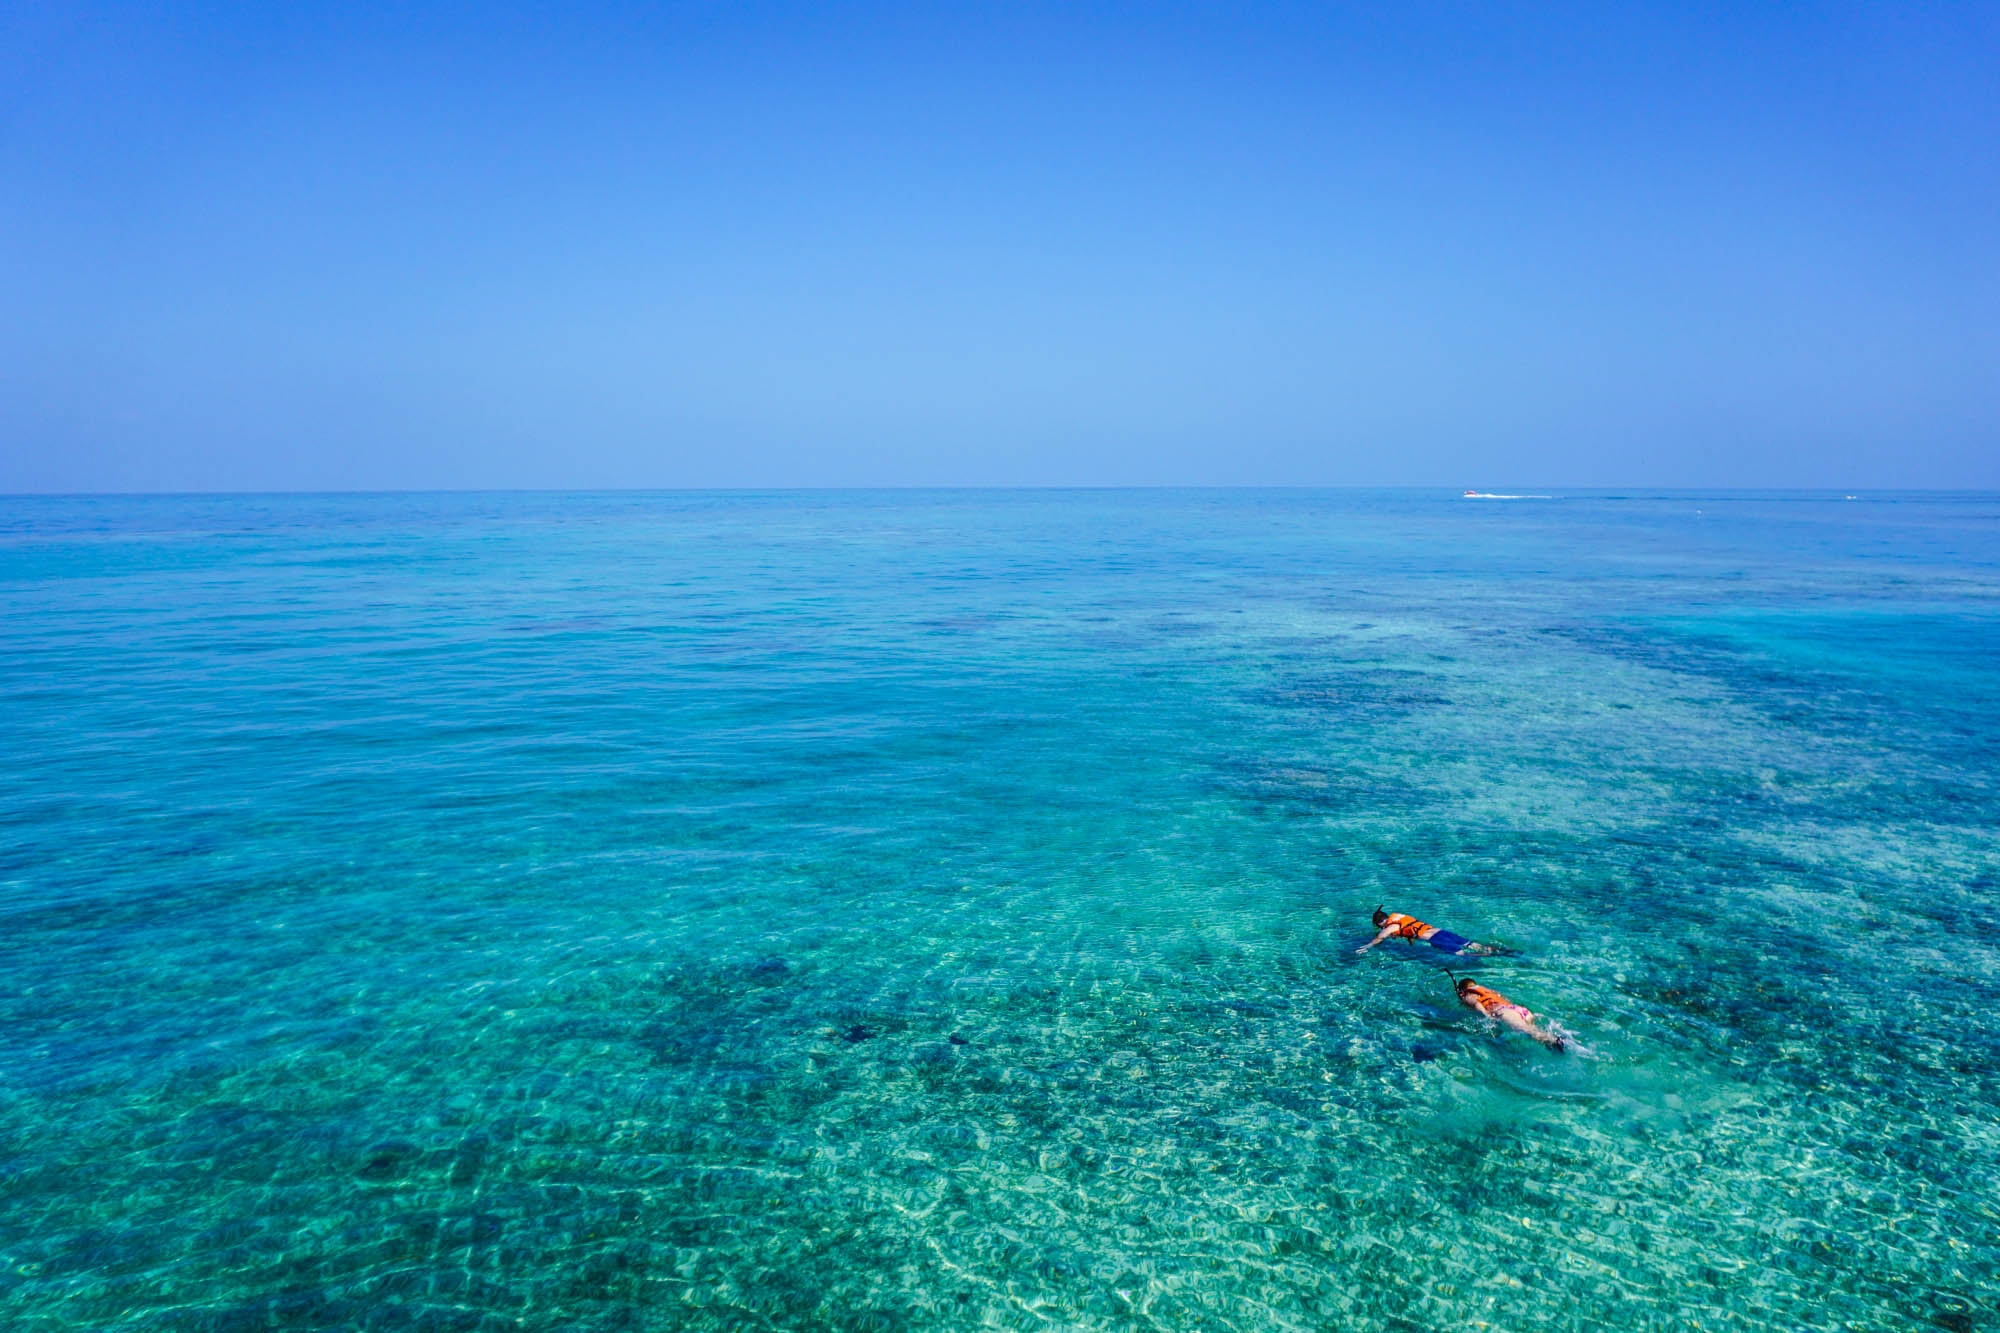 Voyages Yulgo Porto Rico snorkeling Carribean